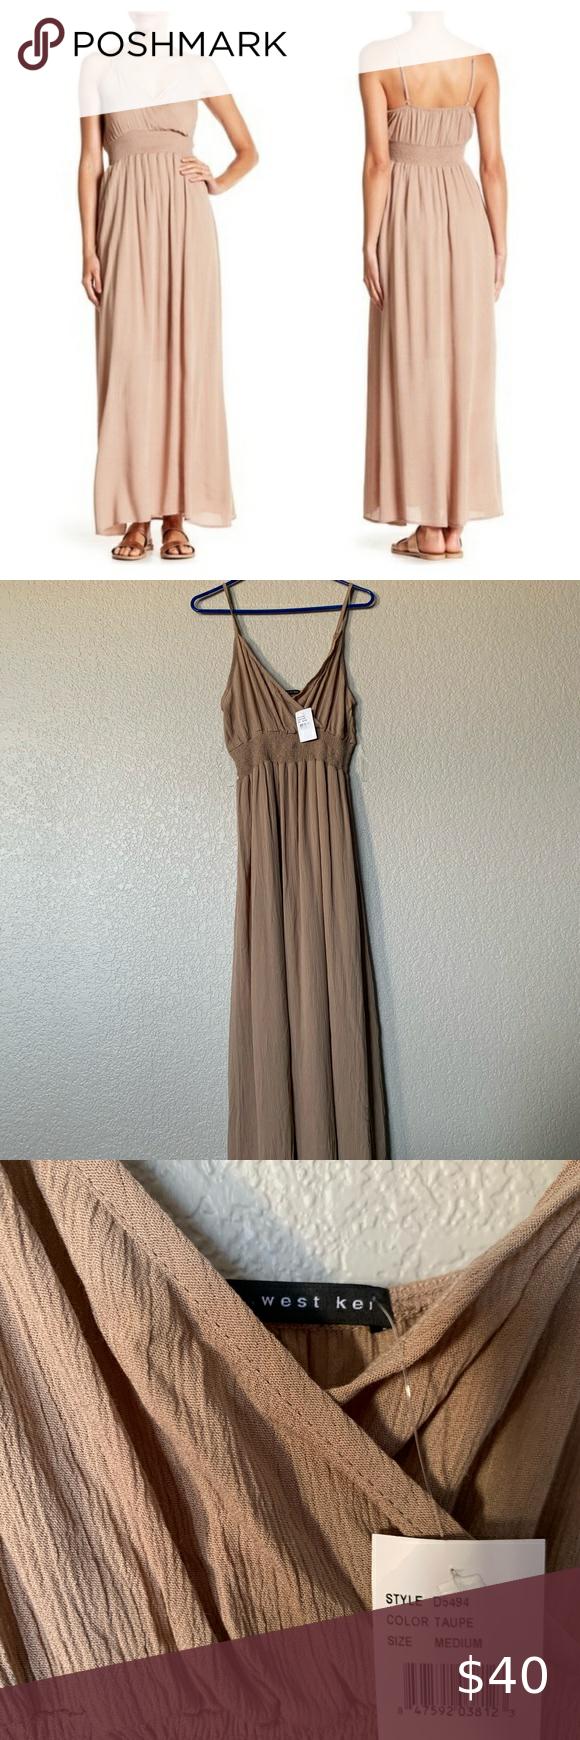 Beautiful Taupe Gauze Maxi Dress In 2020 Gauze Maxi Dress Boutique Maxi Dresses Dresses [ 1740 x 580 Pixel ]